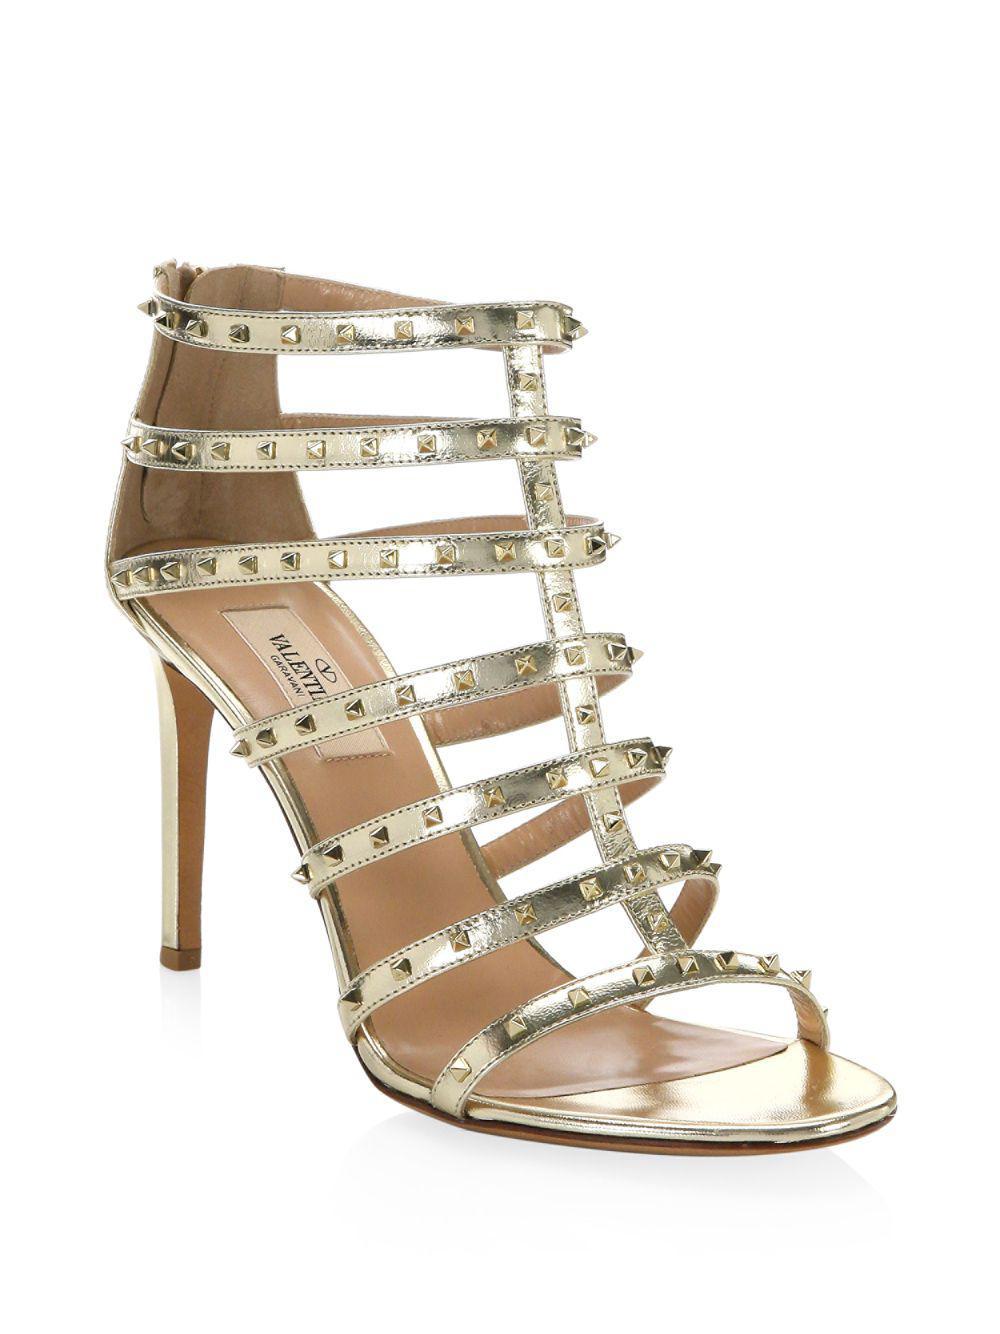 512df1a78c50 Lyst - Valentino Lovestud Metallic Leather Gladiator Sandals in ...